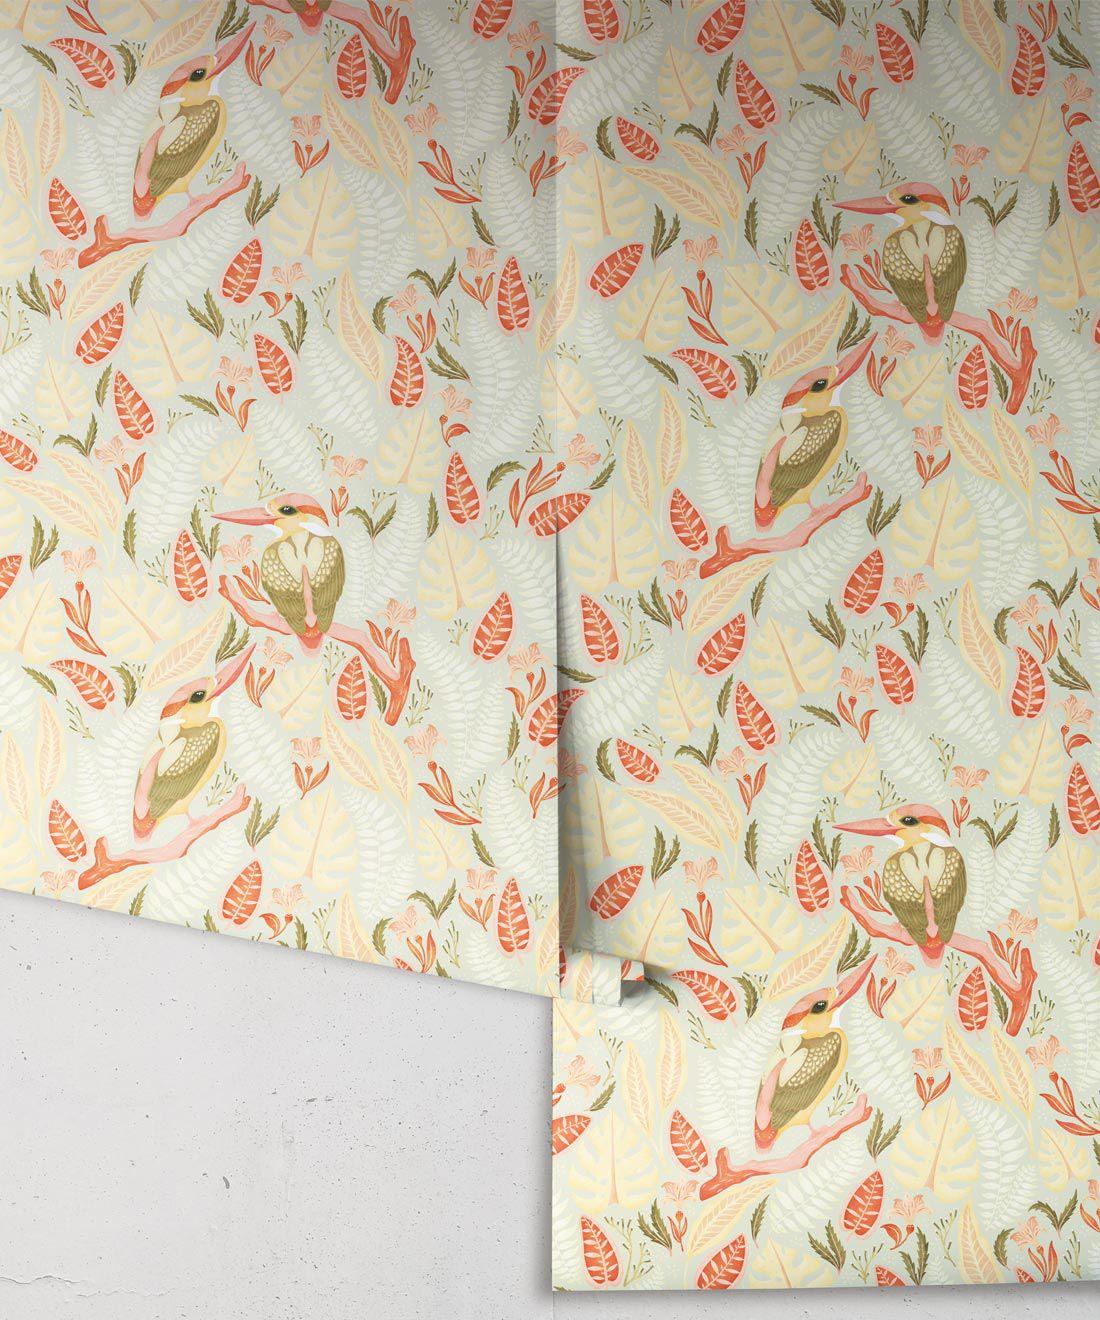 Kingfisher Wallpaper • Bird Wallpaper • Light Pastel Wallpaper Rolls